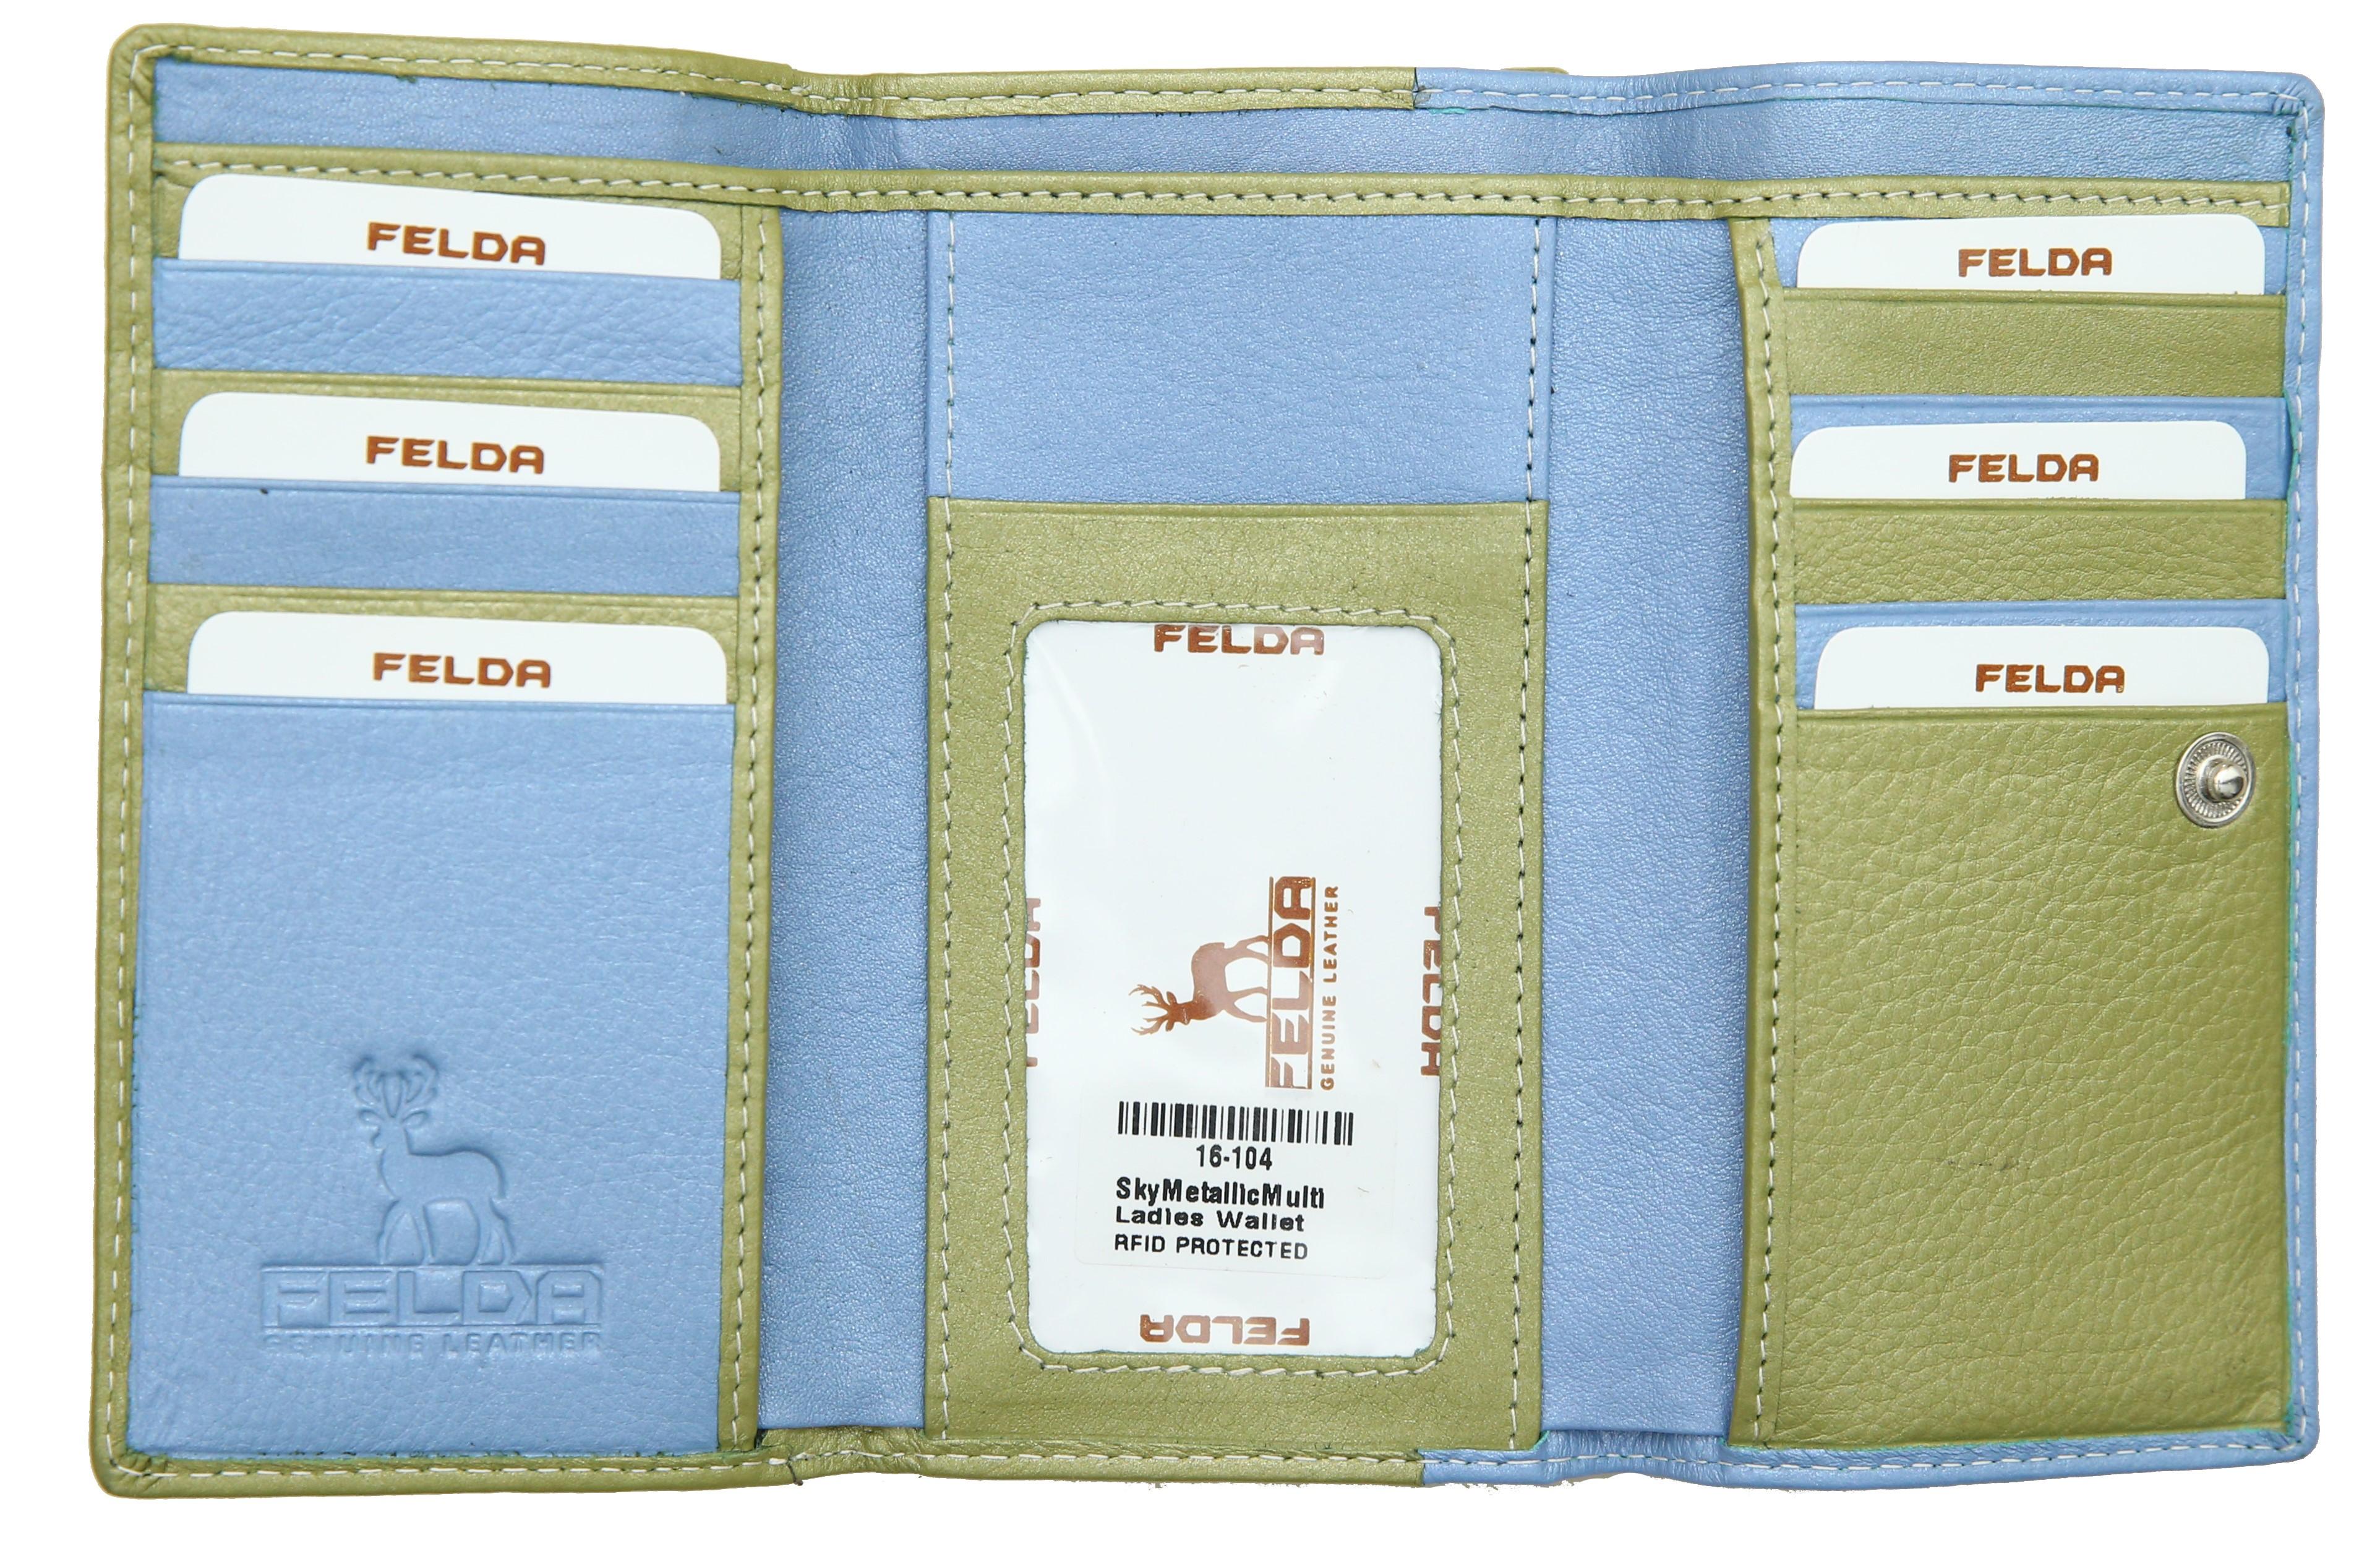 Felda-Portefeuille-pour-cartes-de-credit-cuir-souple-plusieurs-coloris miniature 25